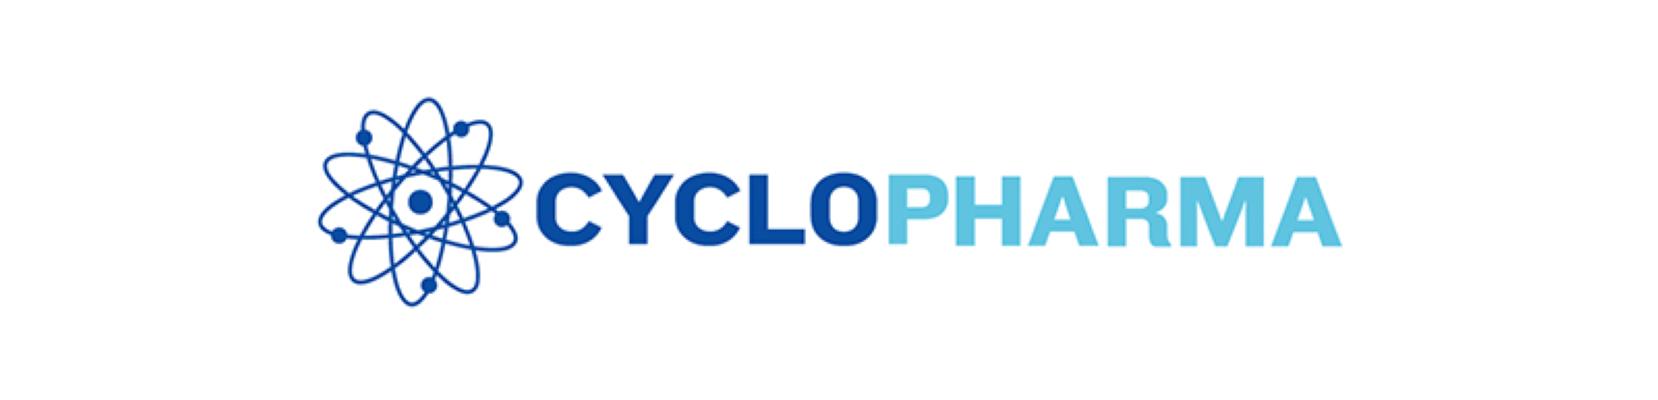 CYCLOPHARMA